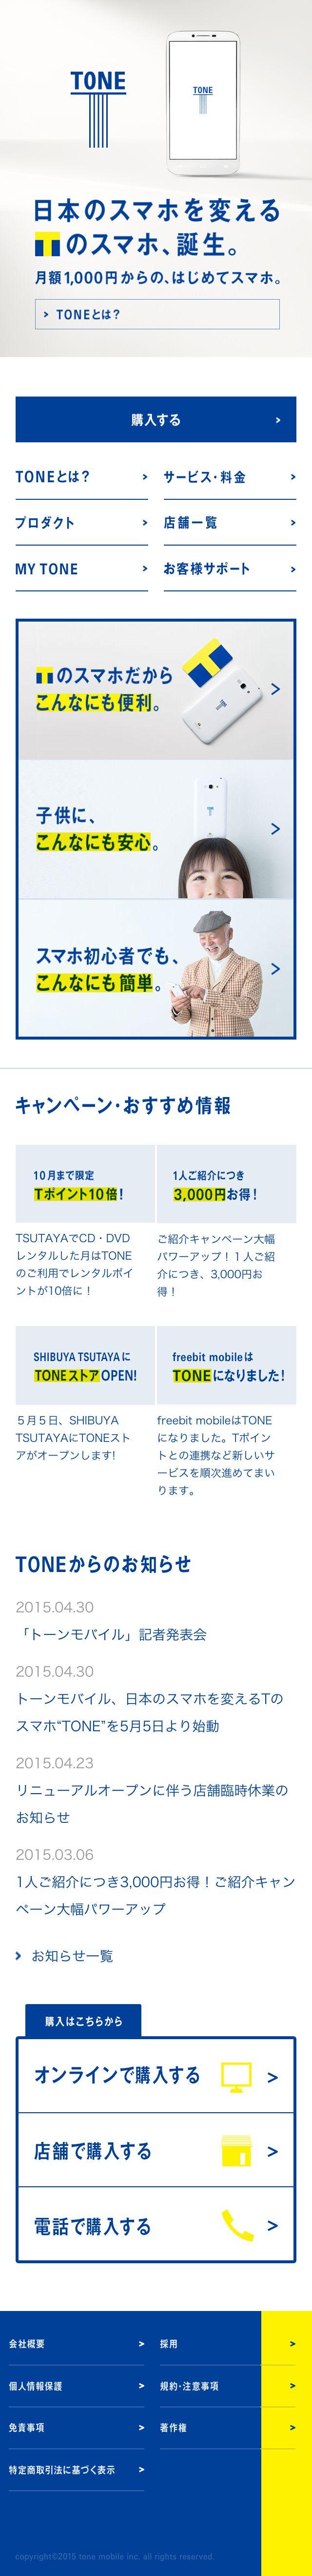 http://tone.ne.jp/